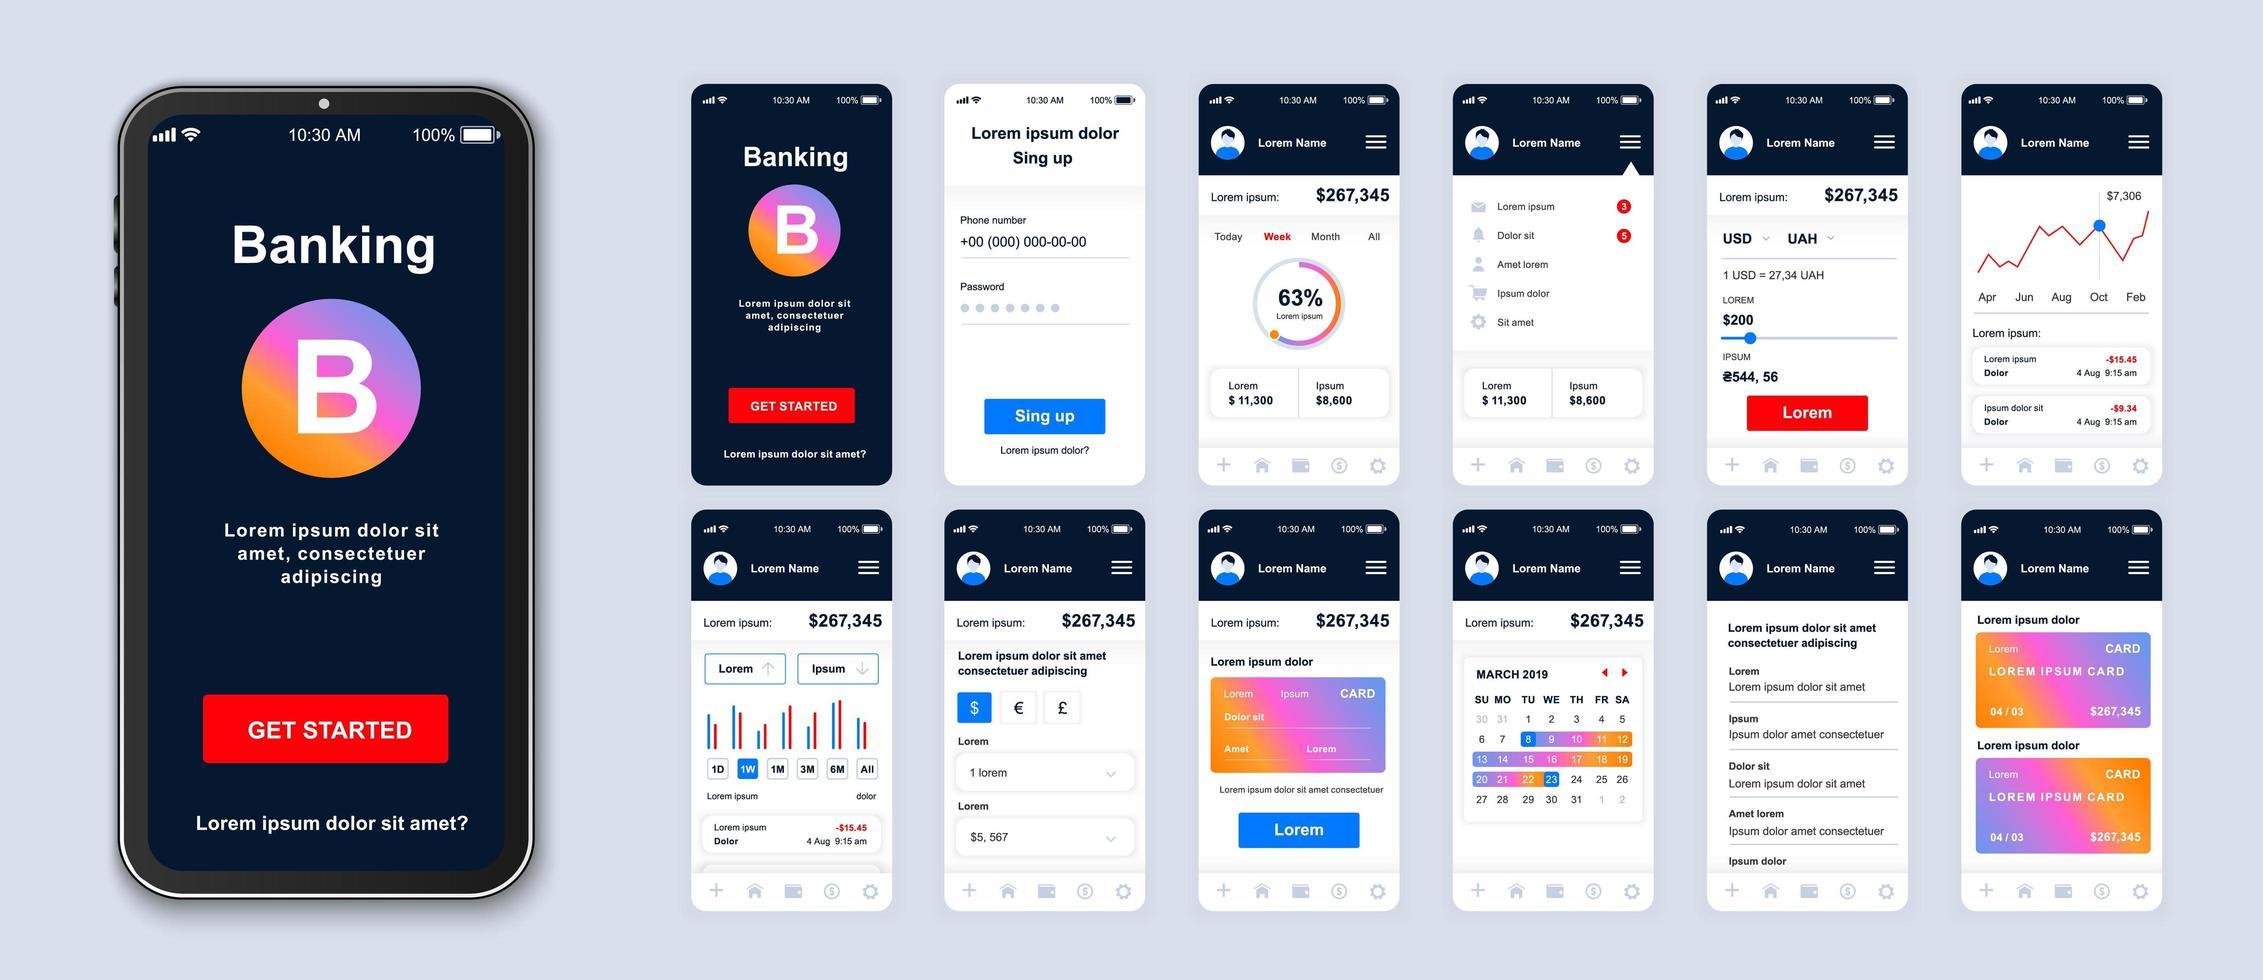 interface de smartphone de interface do usuário de banco móvel gradiente colorido vetor